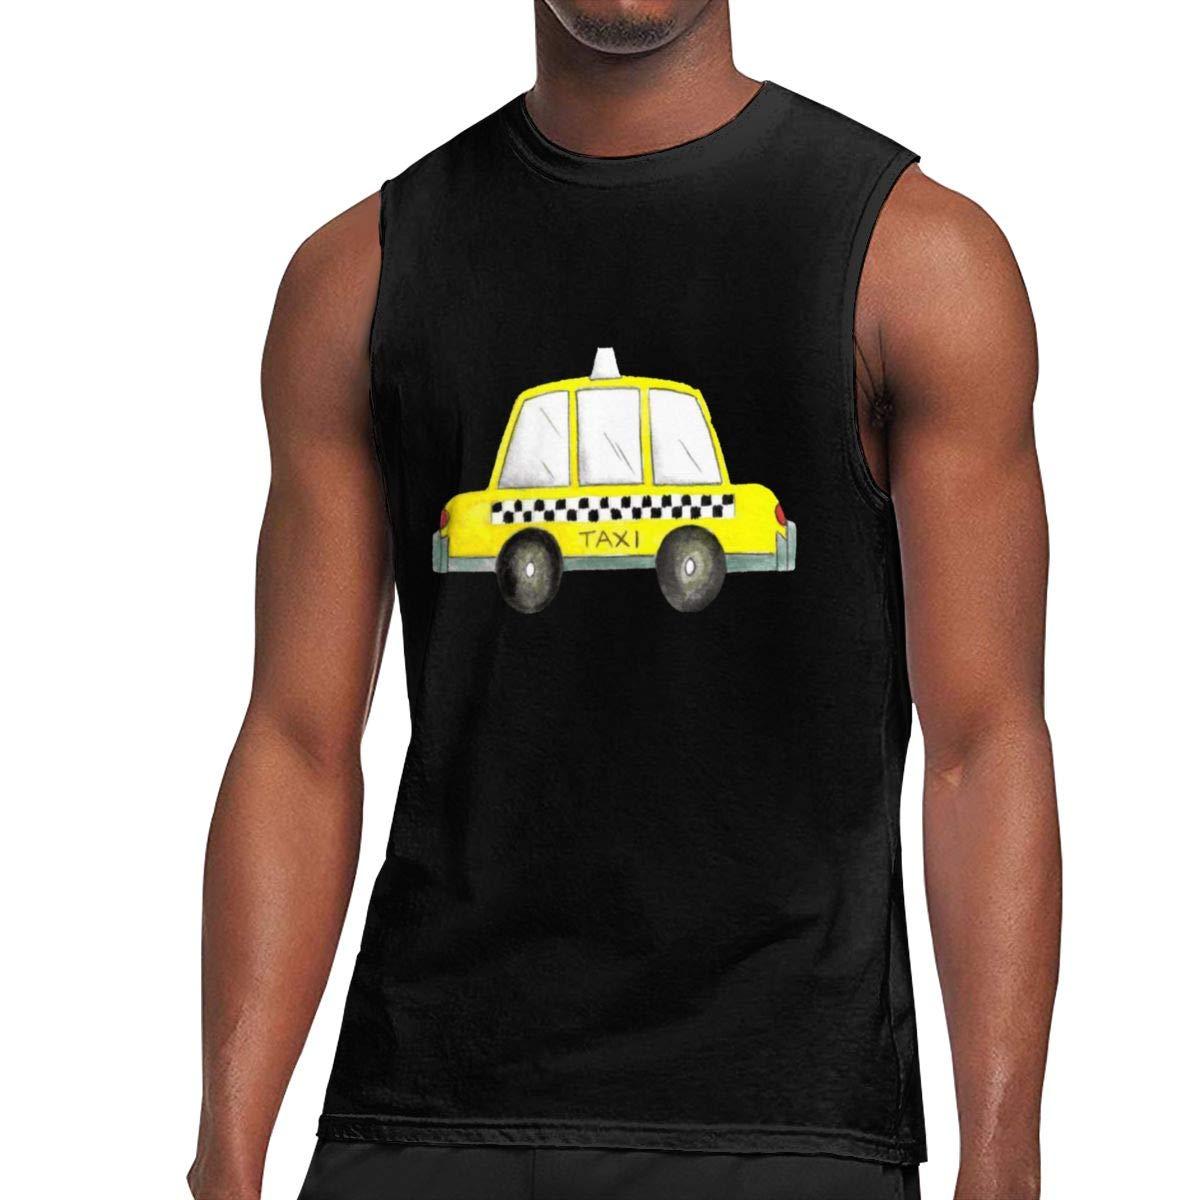 Seuriamin Taxi Nyc Yellow New York City Checkered Cab Car S Summer Tennis Sleeveless Muscl